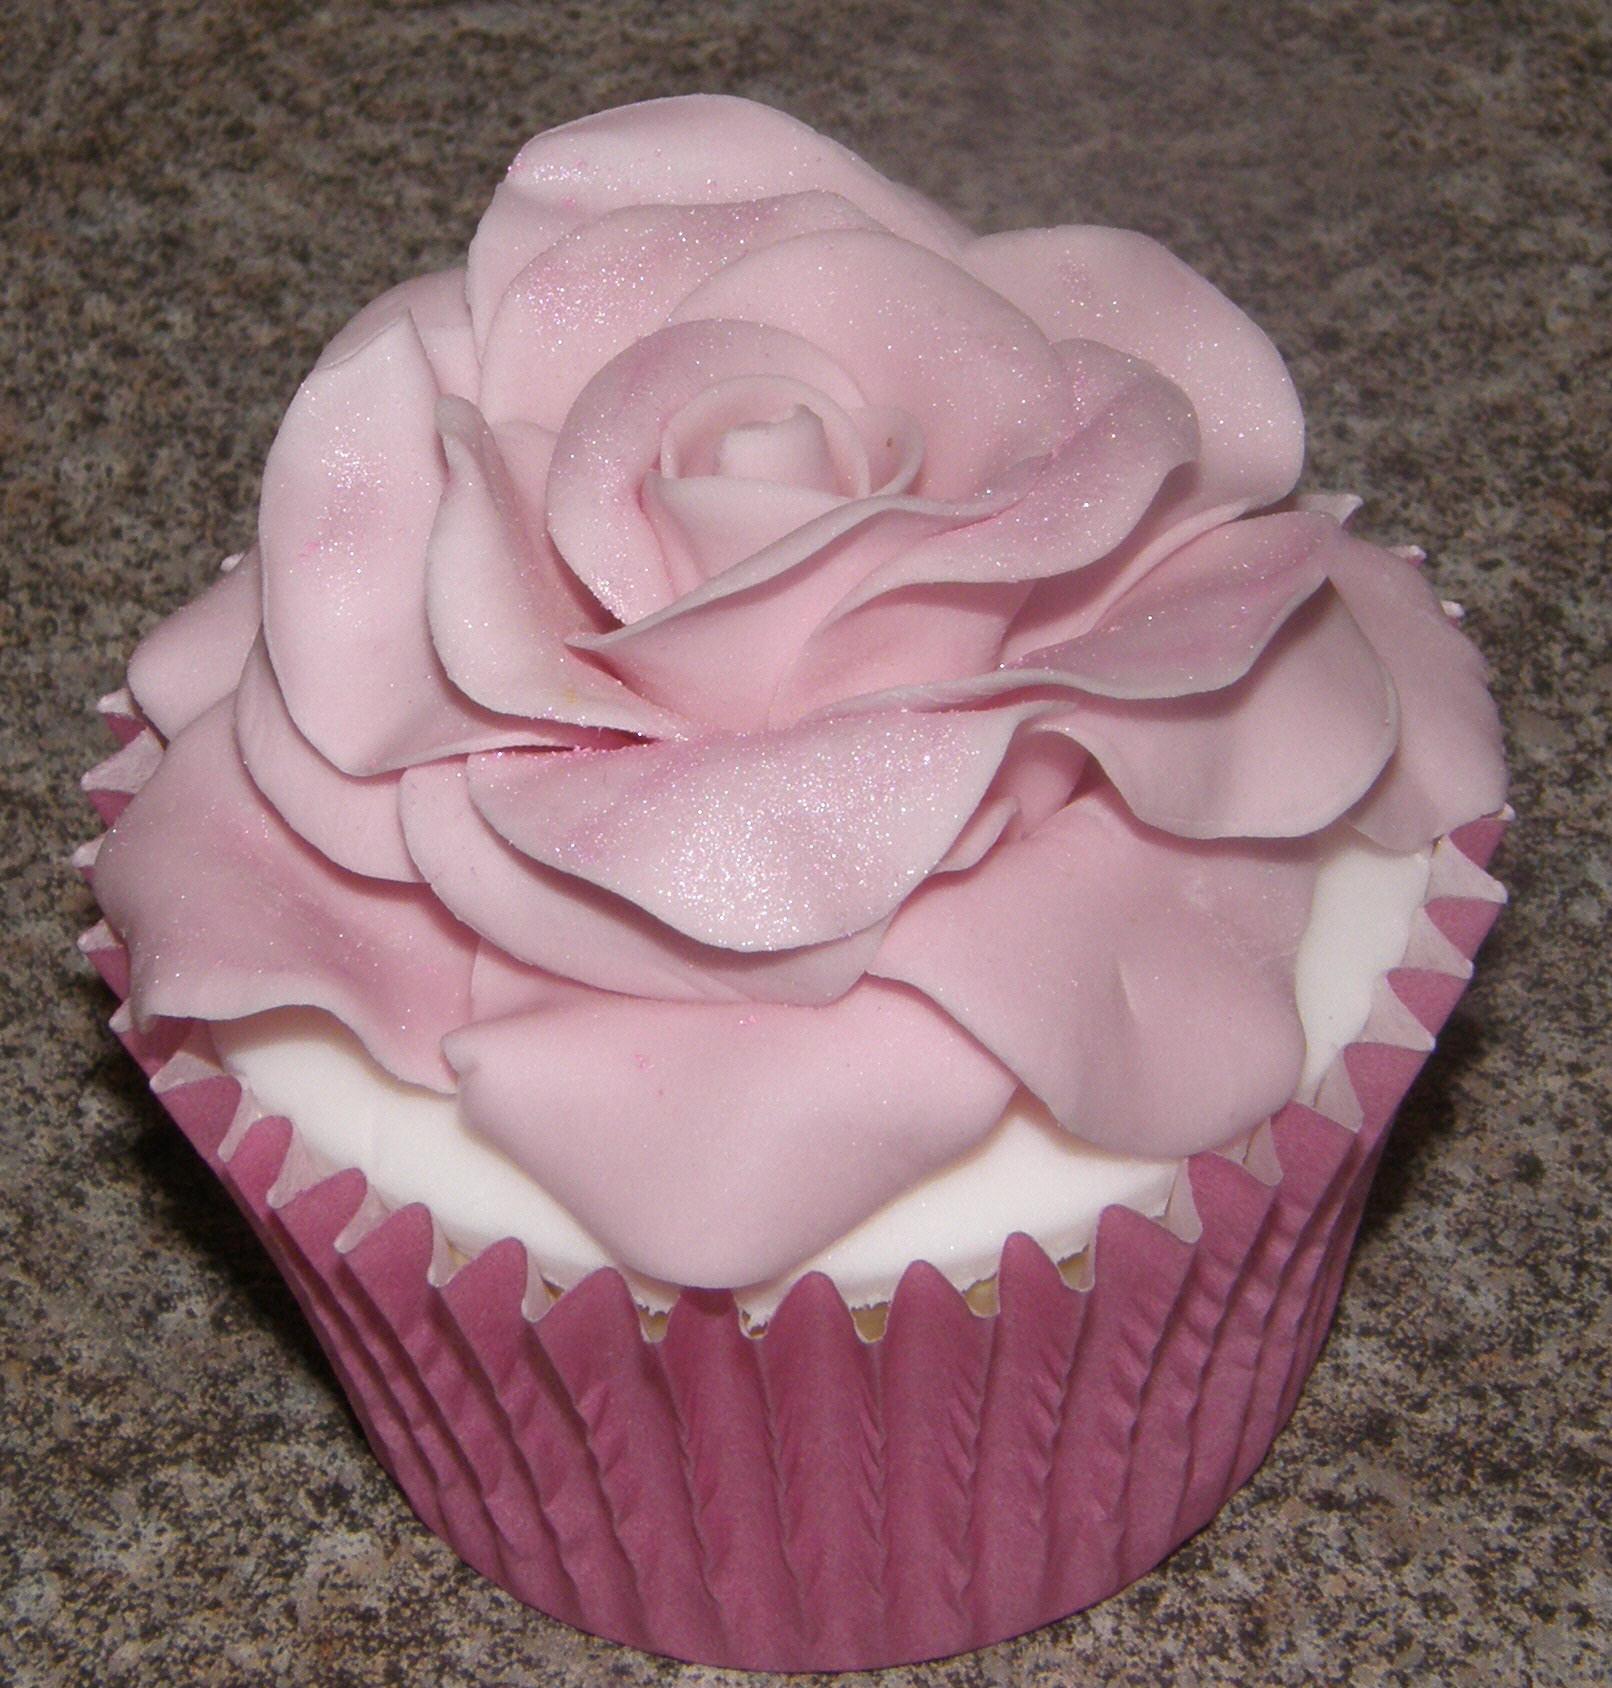 Cupcake IdeasCupcakes  shmupcakes   Cupcake Ideas